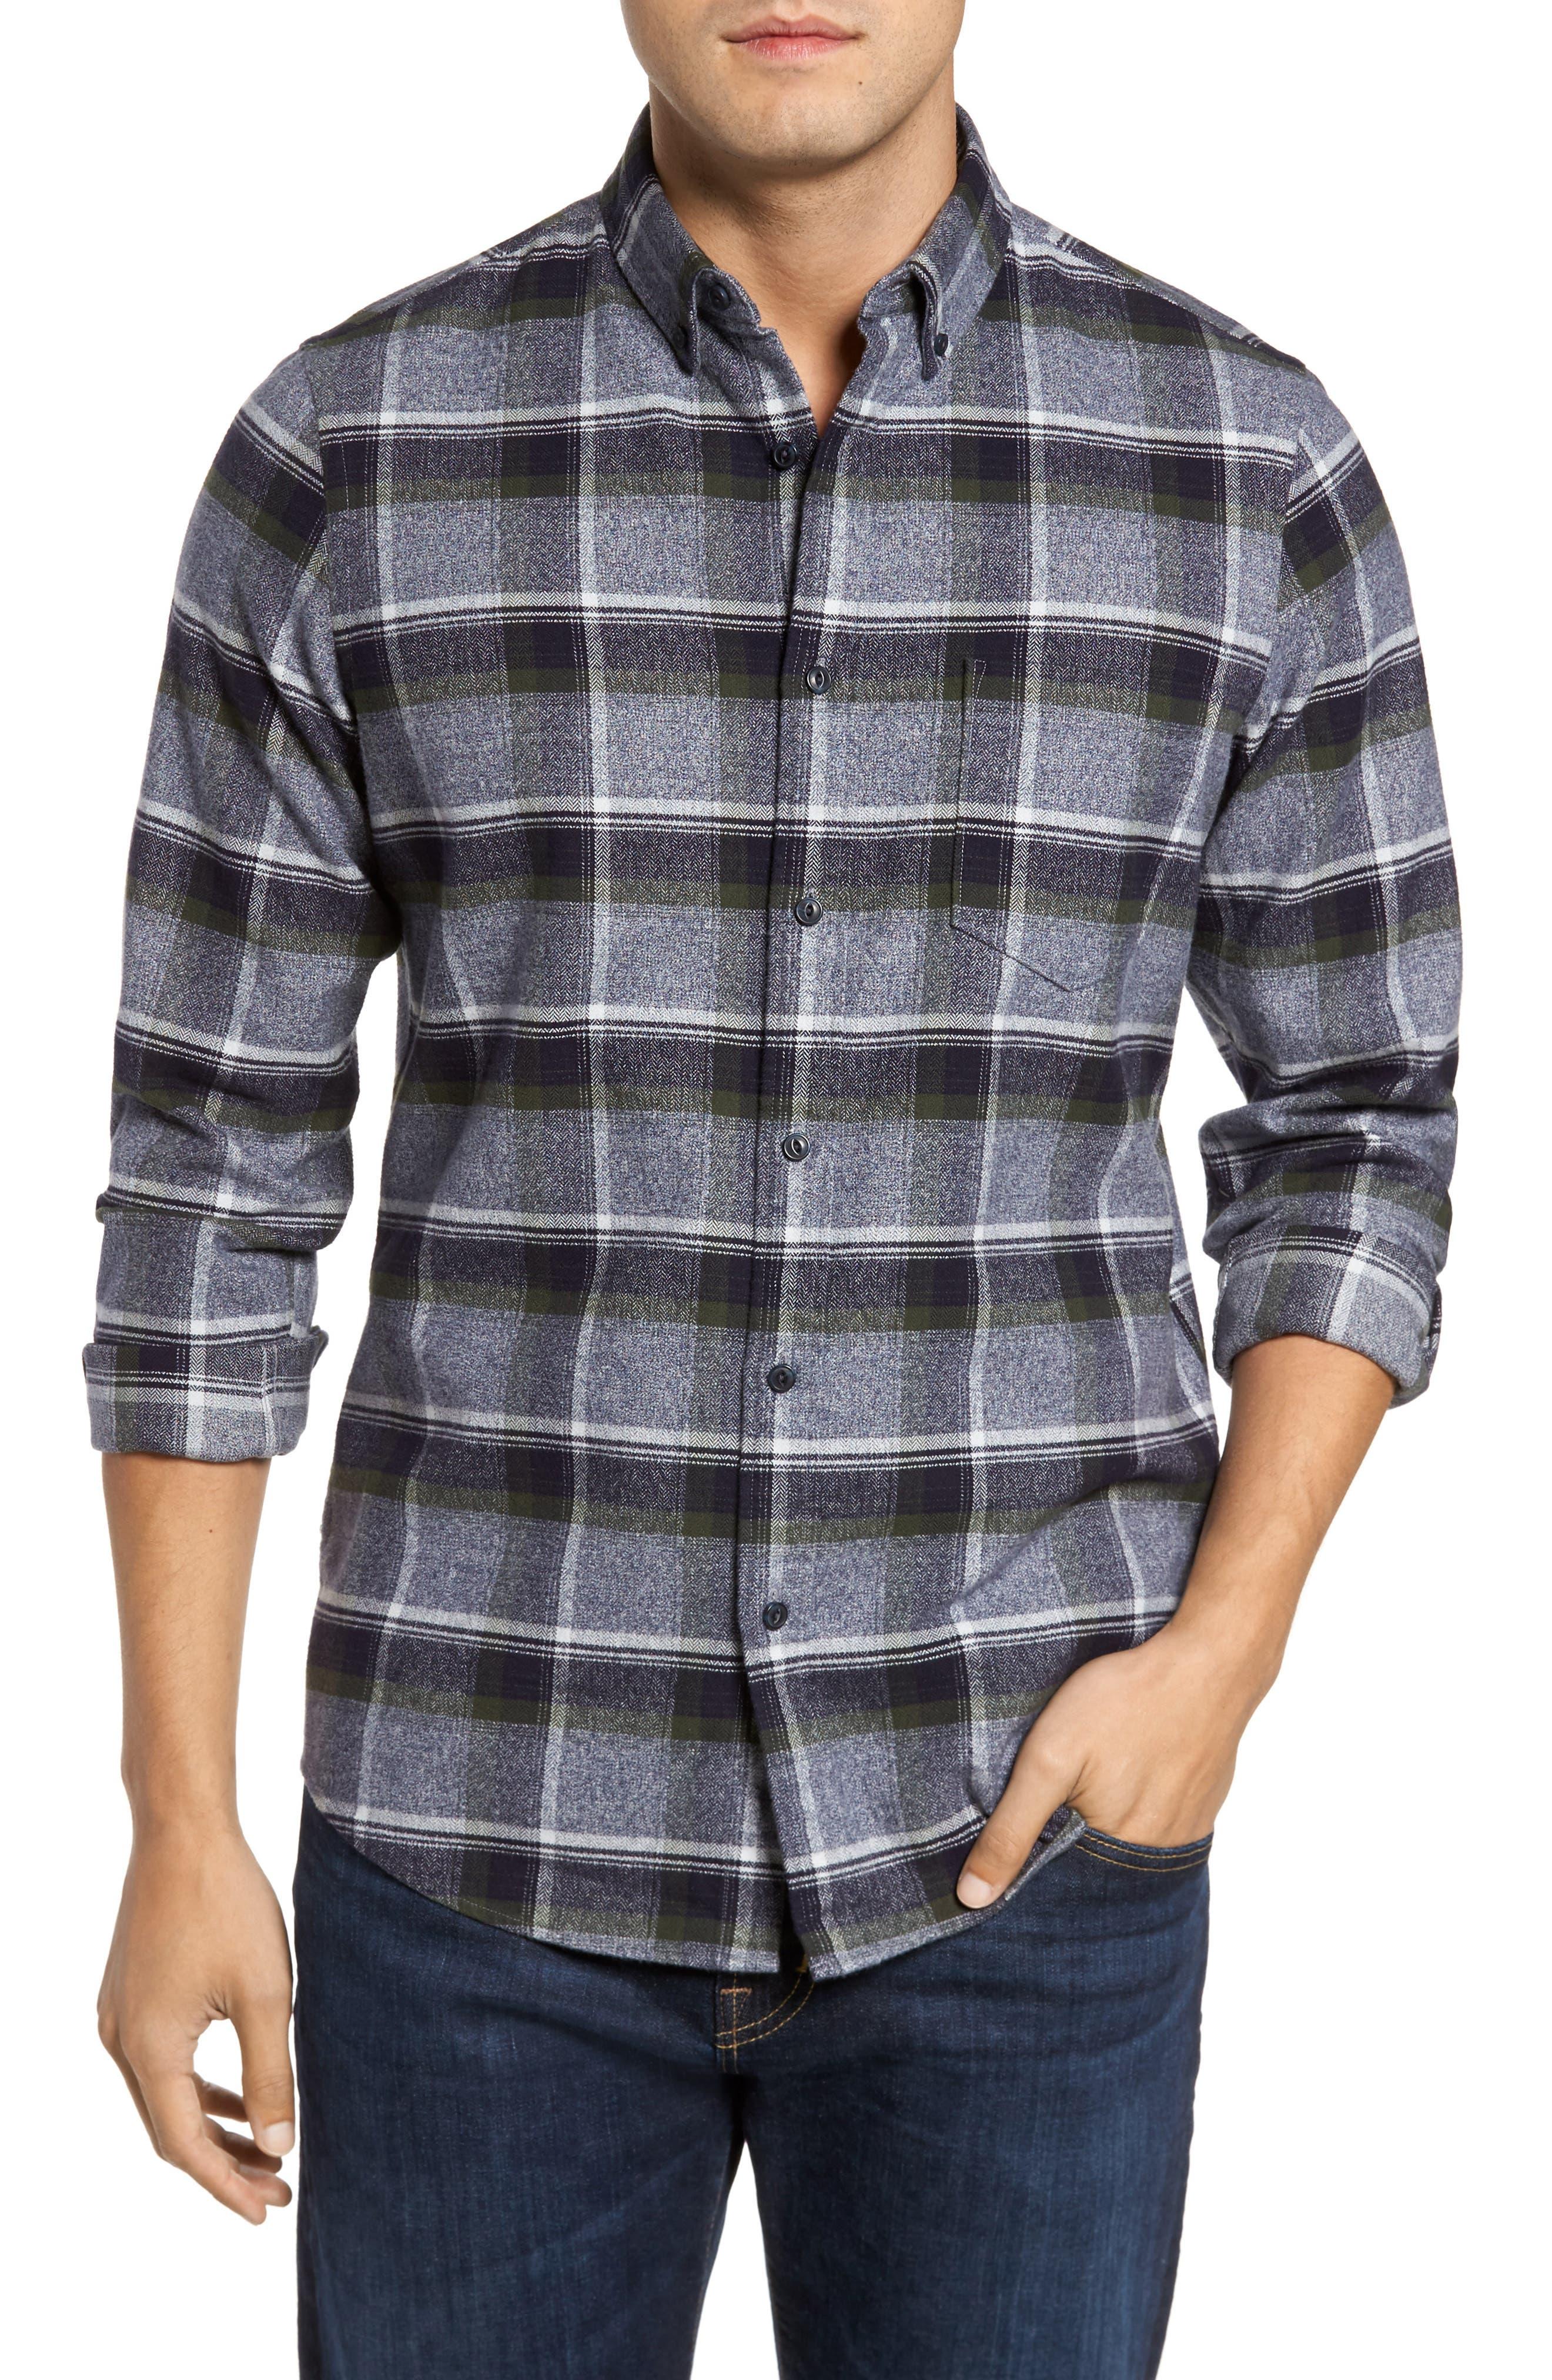 Main Image - Nordstrom Men's Shop Regular Fit Plaid Flannel Shirt